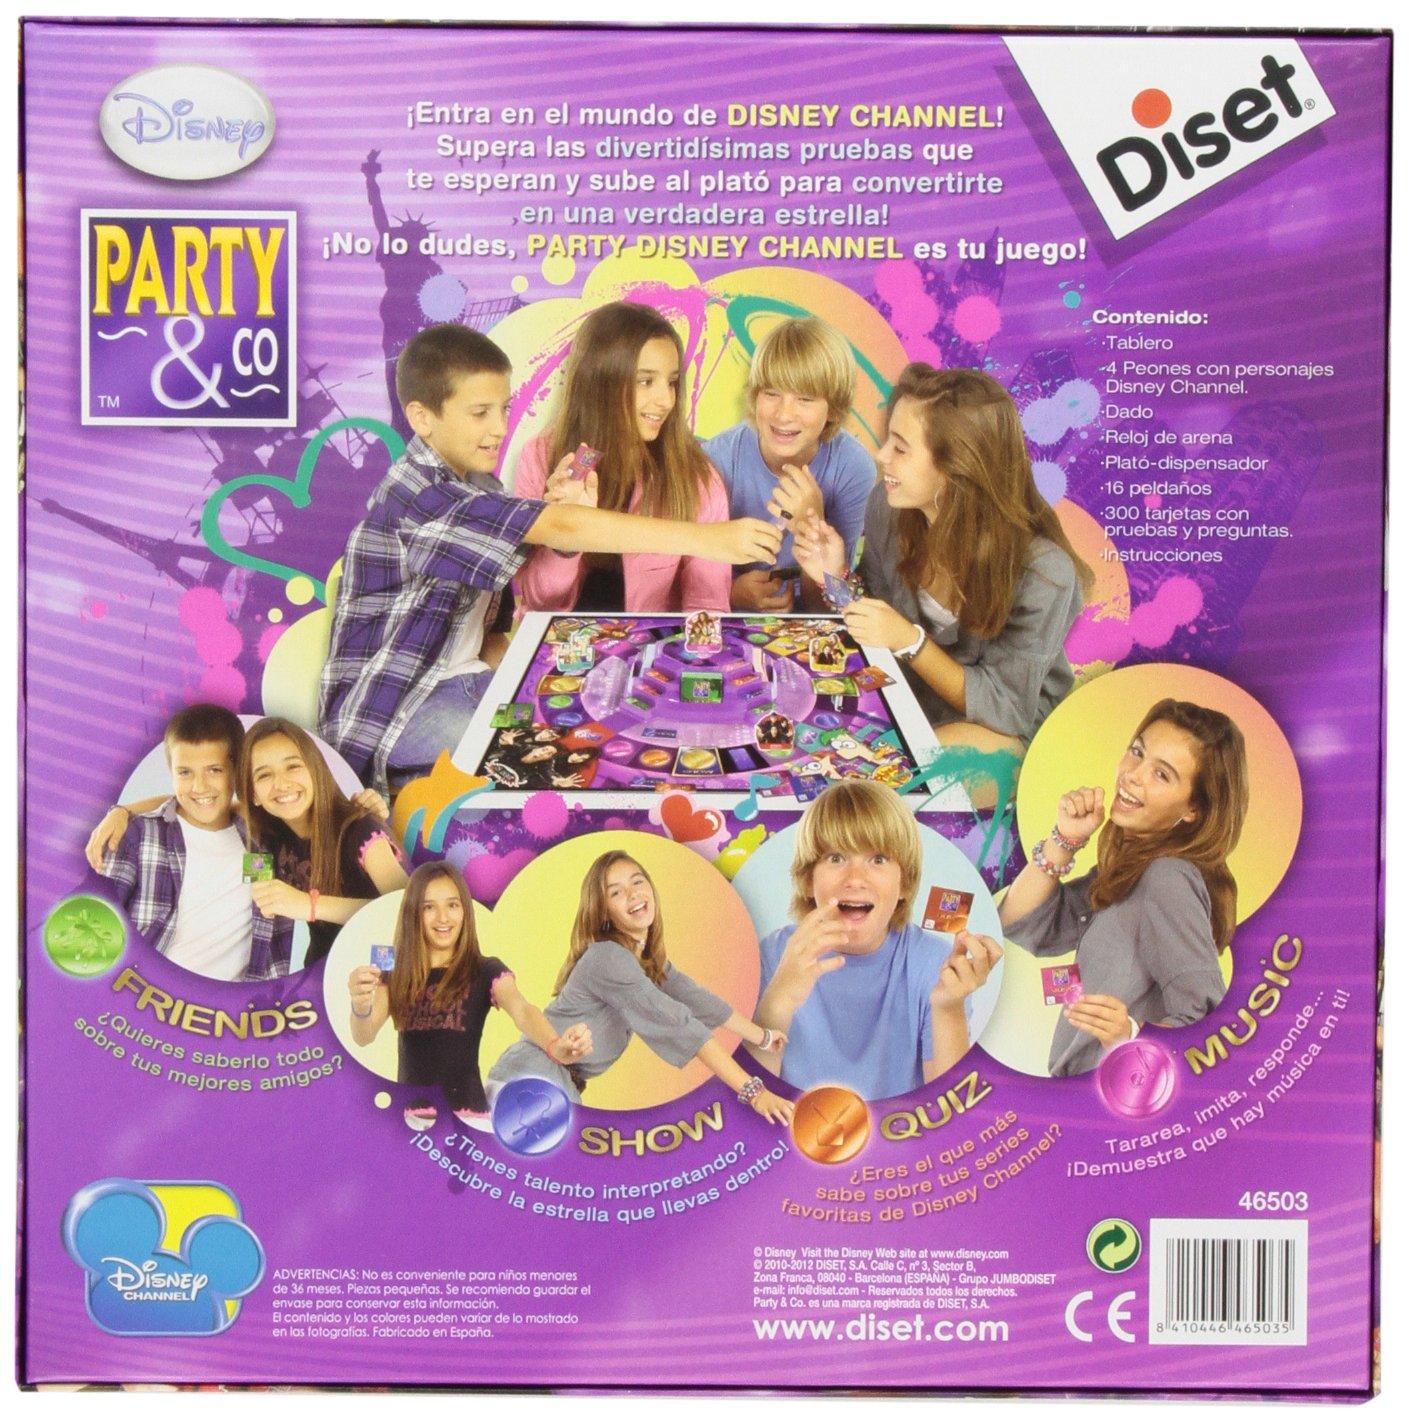 Diset Disney - Party & Co 3.0, Juego de Mesa 46503